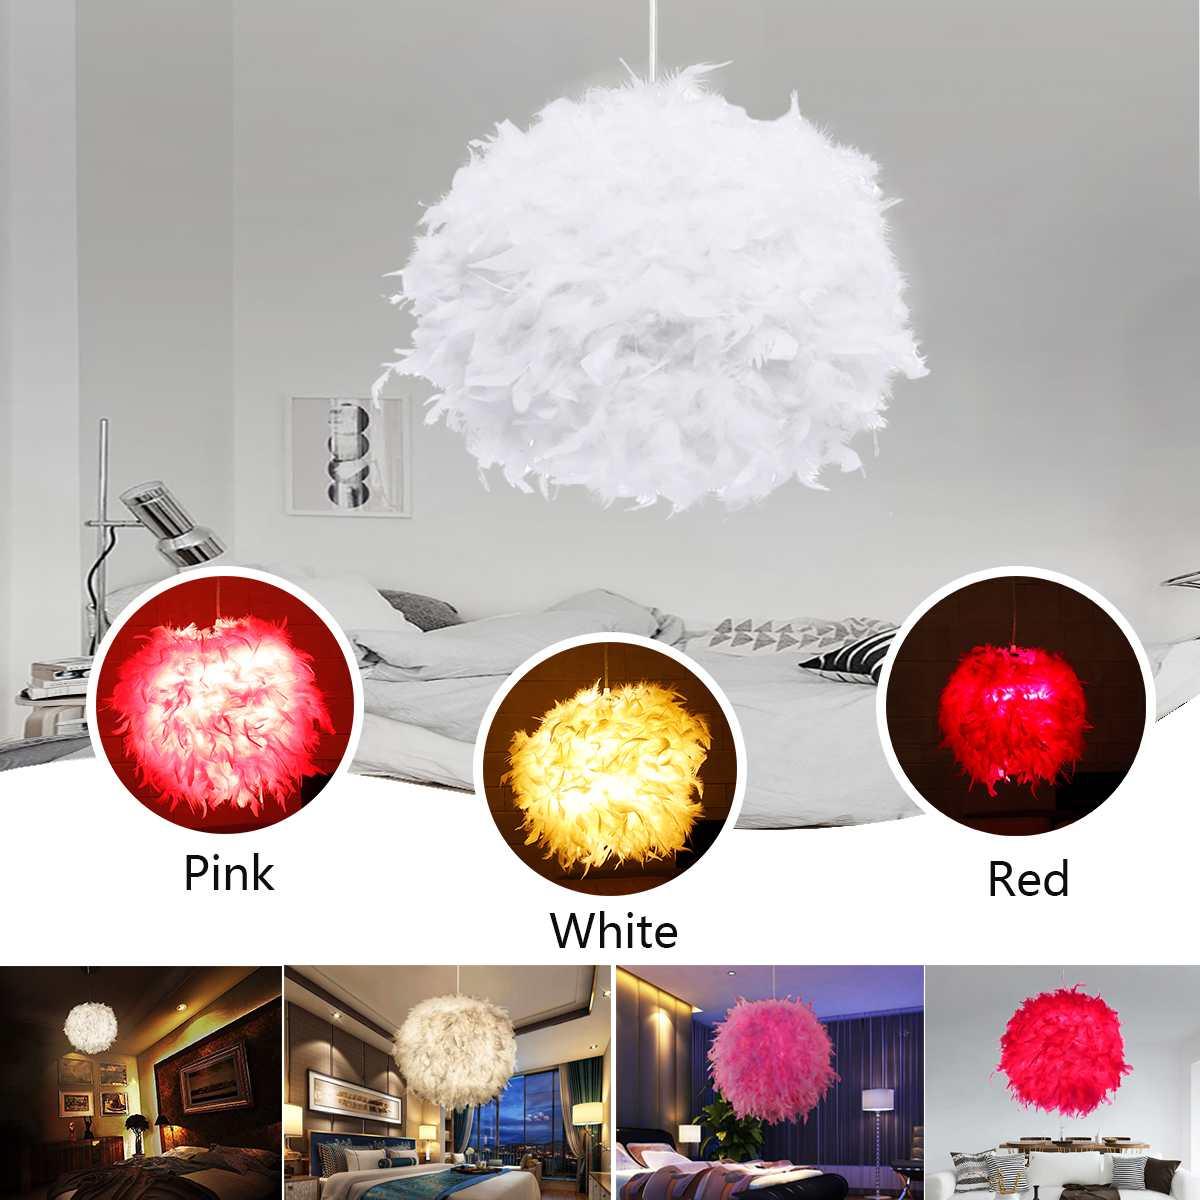 Ceiling Pendant Light Shade Modern Feather Ball Lamp shade Bedroom Living Room Red/Pink/White 110 220V E27 Soft Safe Decor